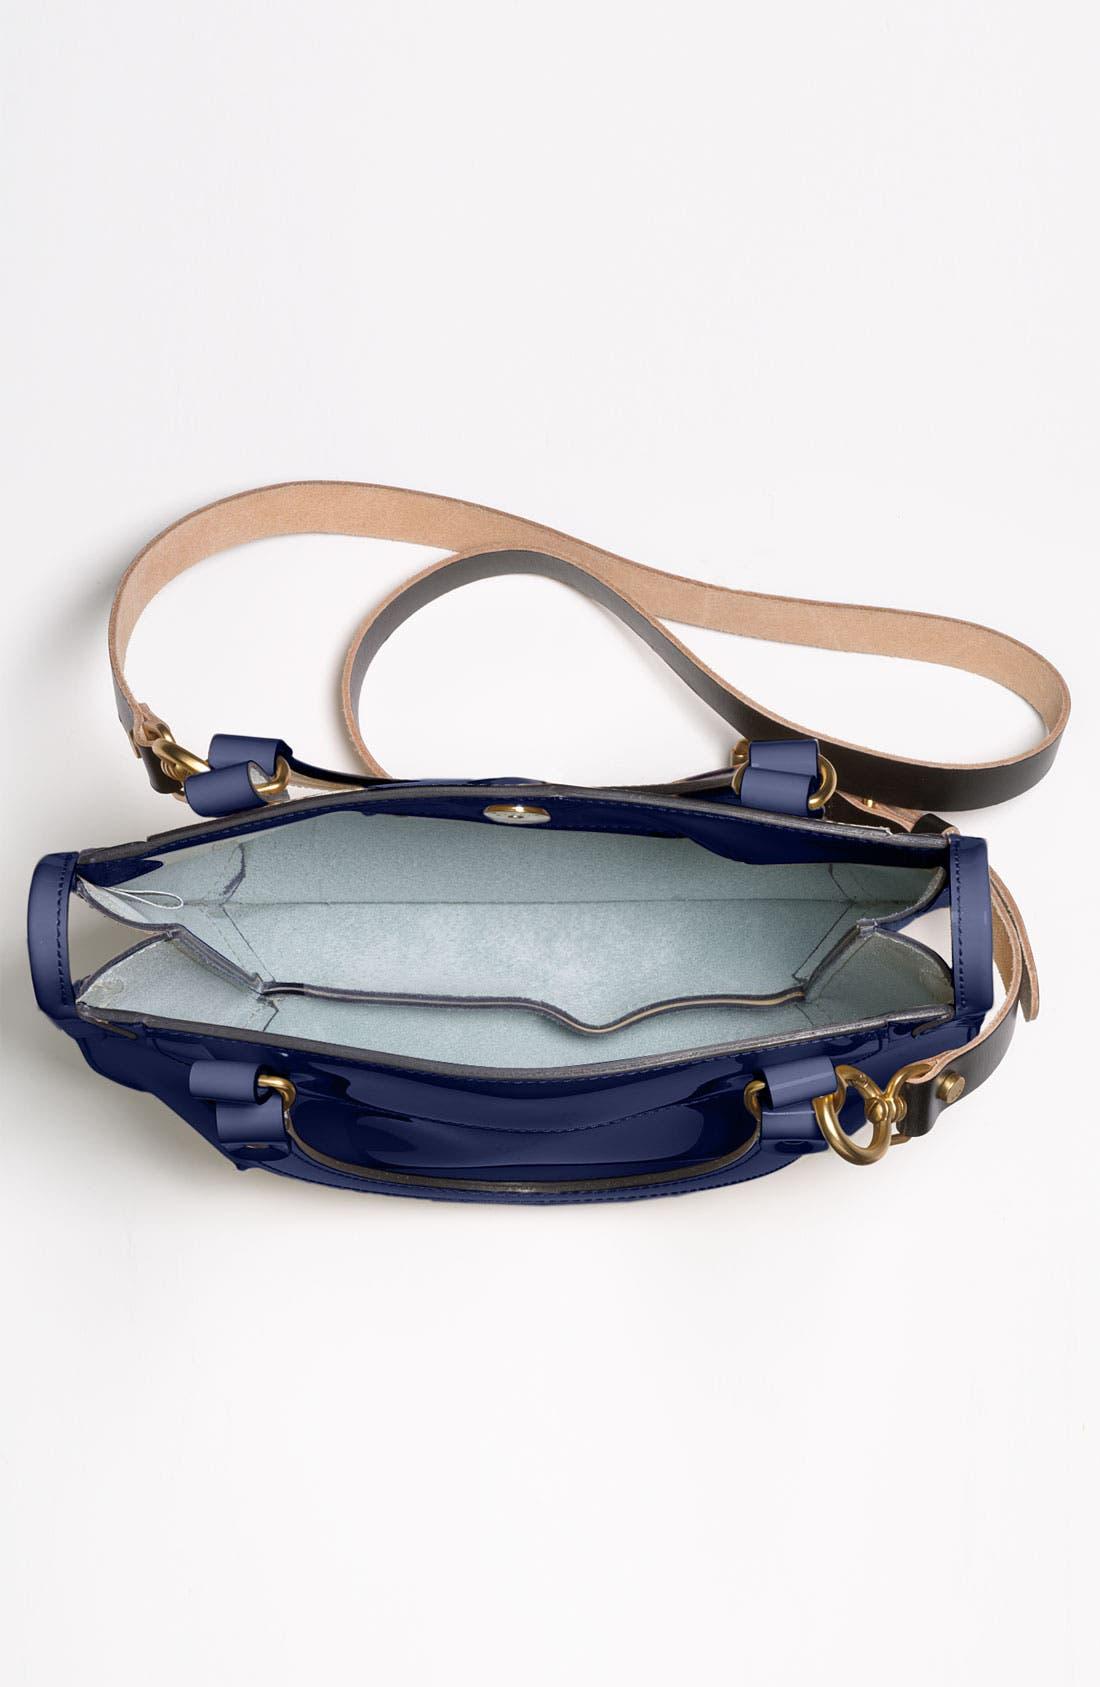 Alternate Image 3  - Marni 'Small' Patent Leather Crossbody Bag